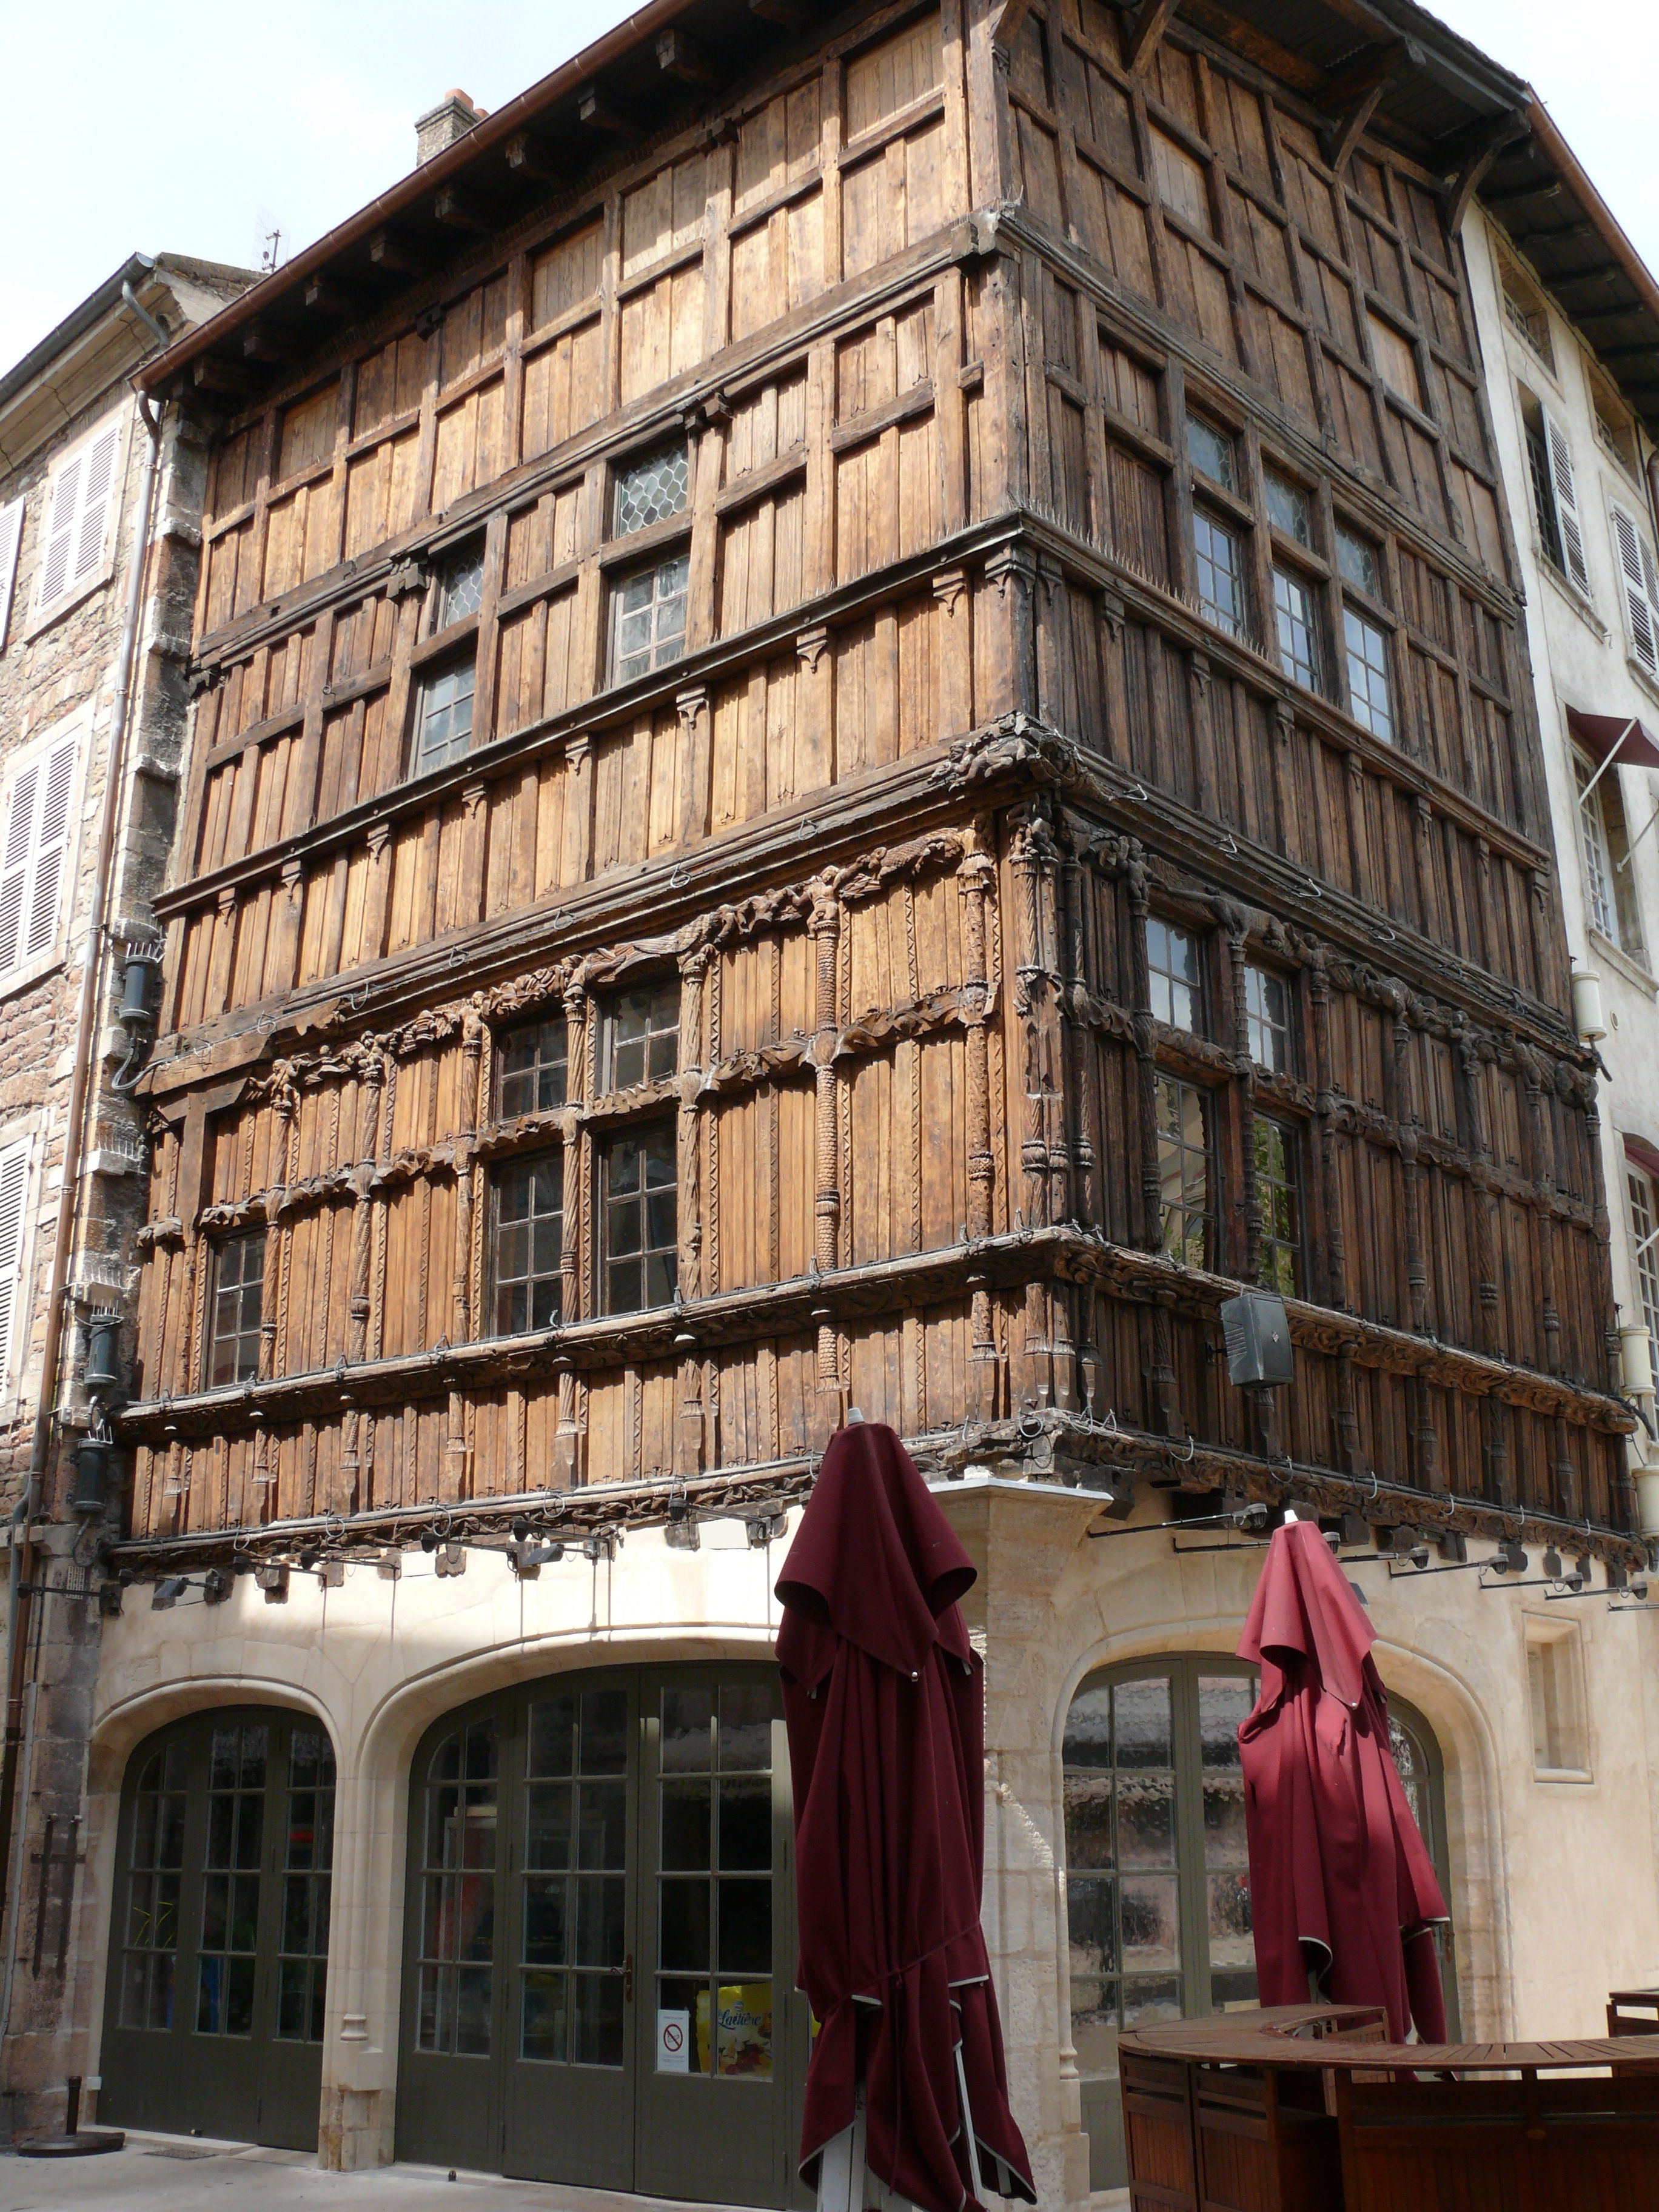 La maison de bois macon - La maison de bois macon ...